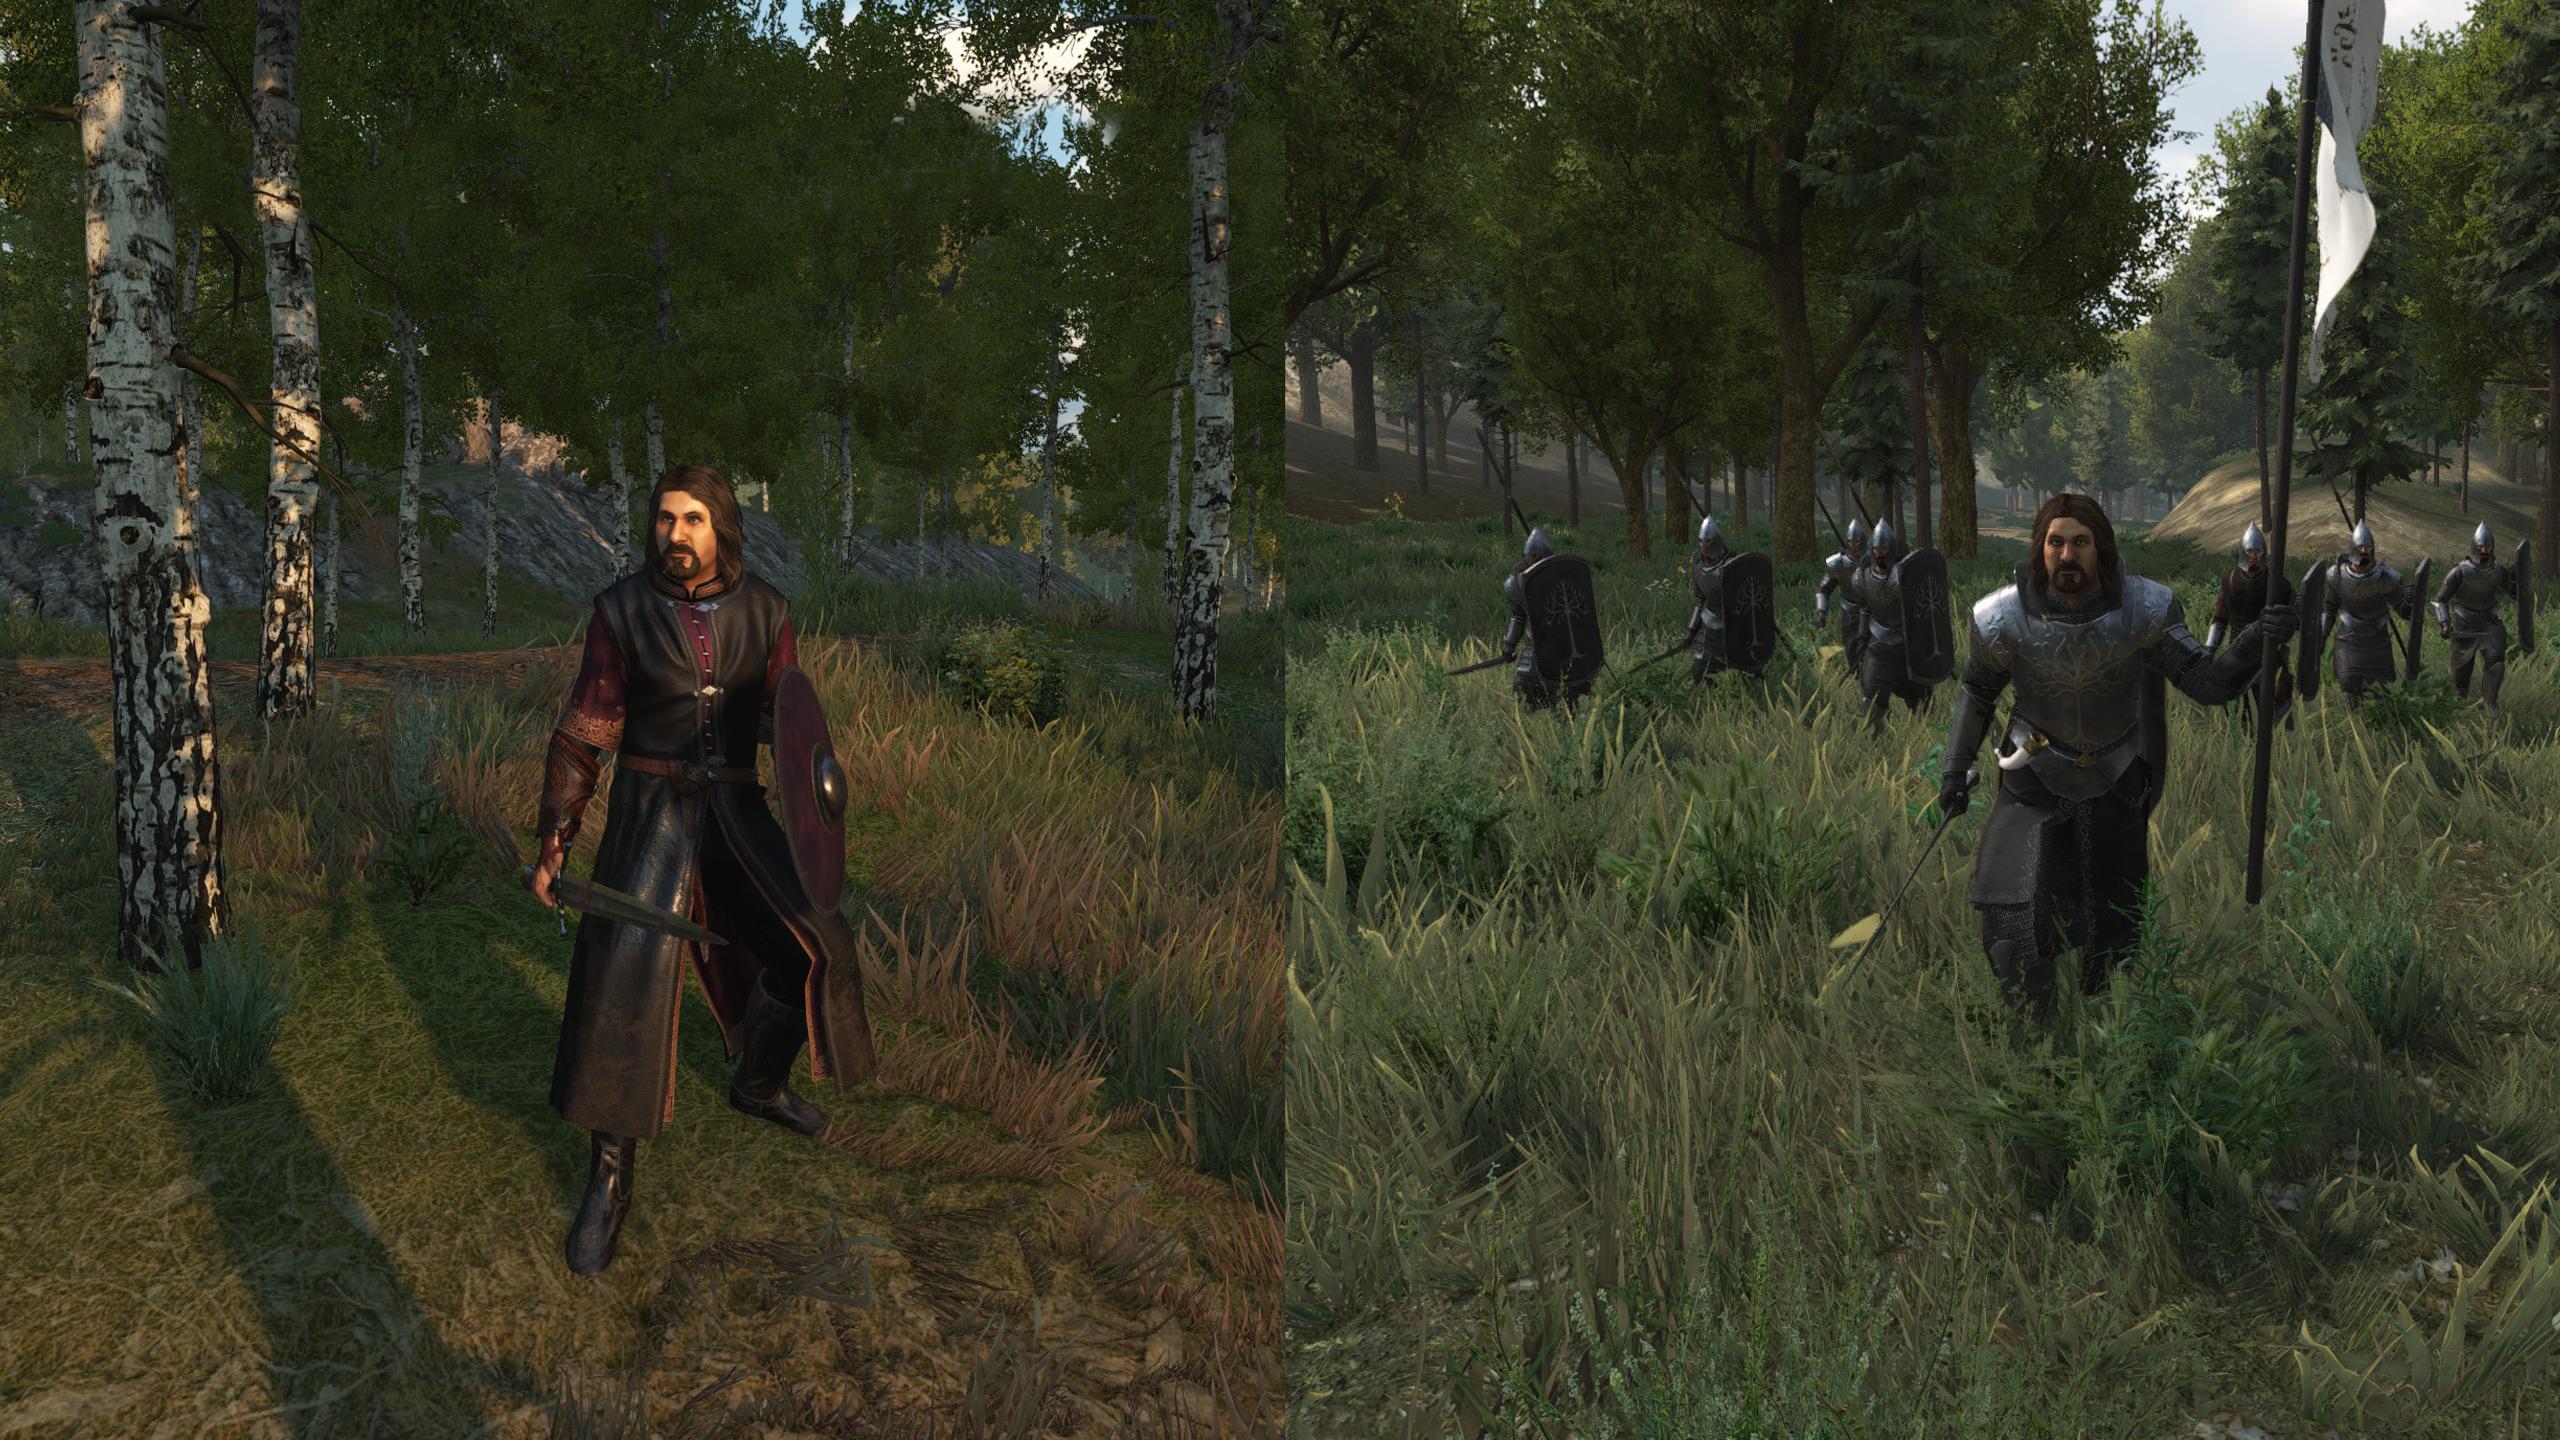 Boromir_Captain_of_Gondor.png